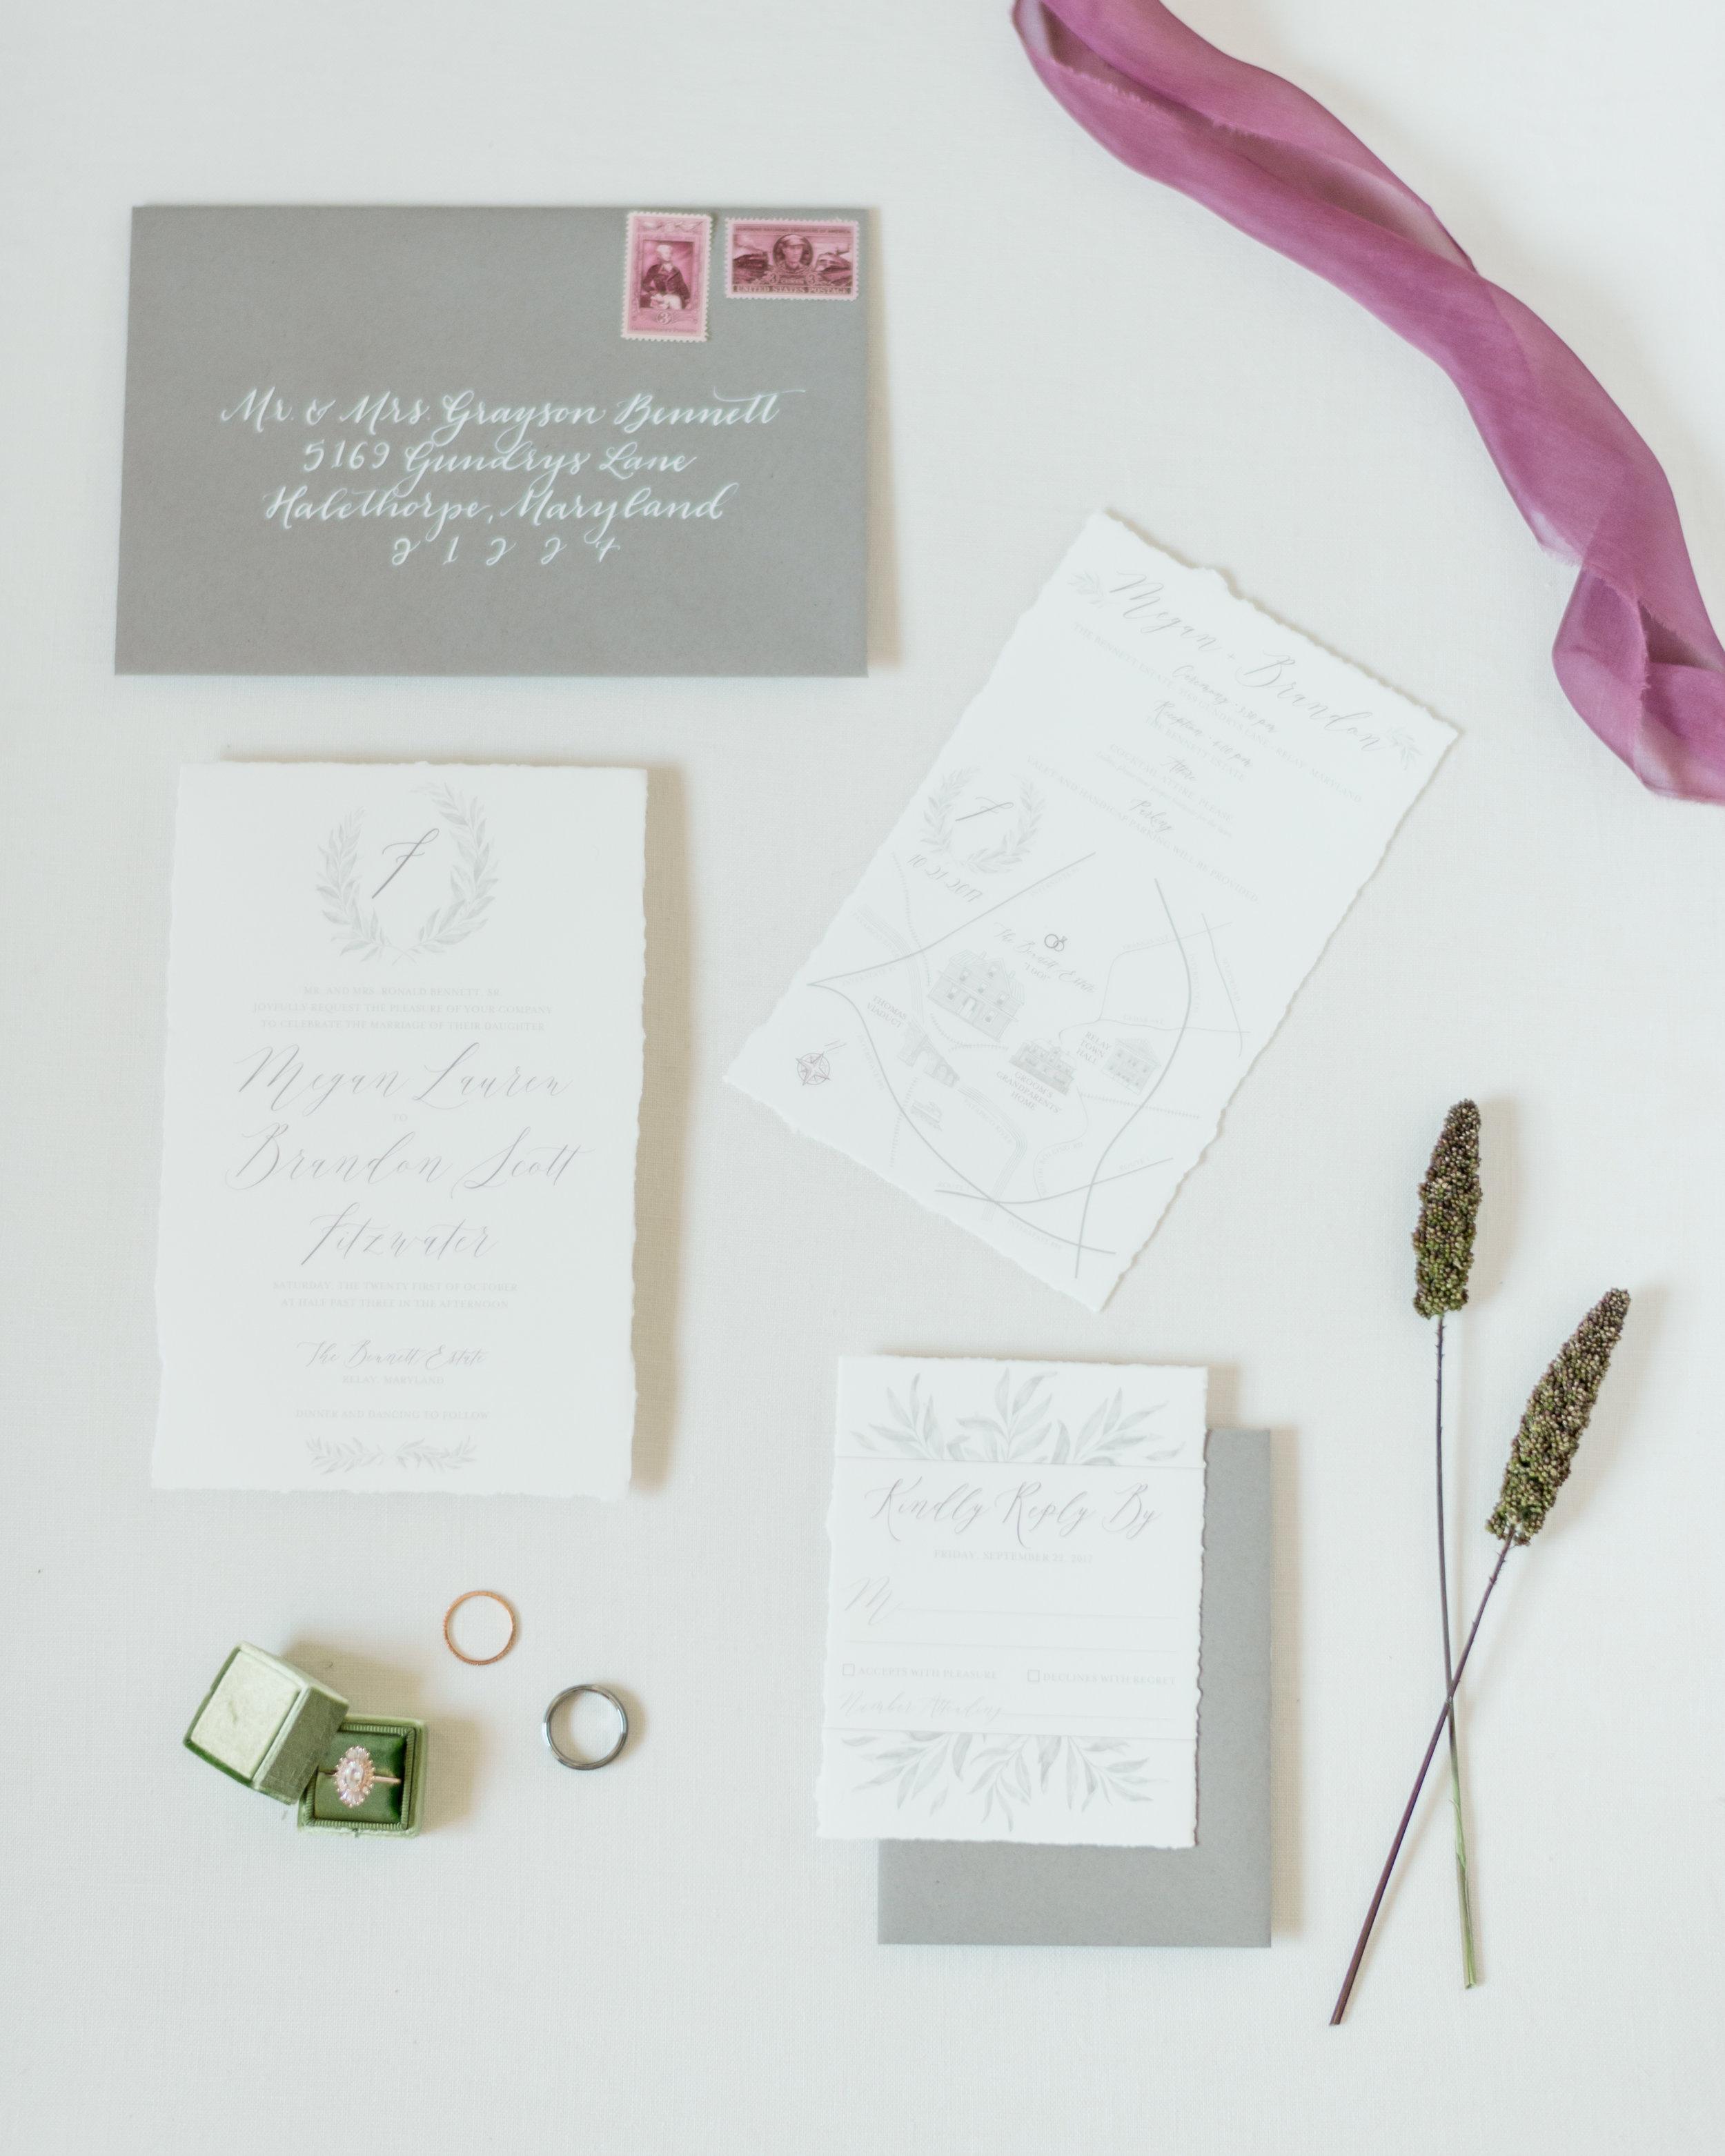 Invitation Suite Design: Susan Wilson Designs. Envelope Calligraphy:  Allison Dee Calligraphy . Photo Credit:  Lauren R Swann Photography .